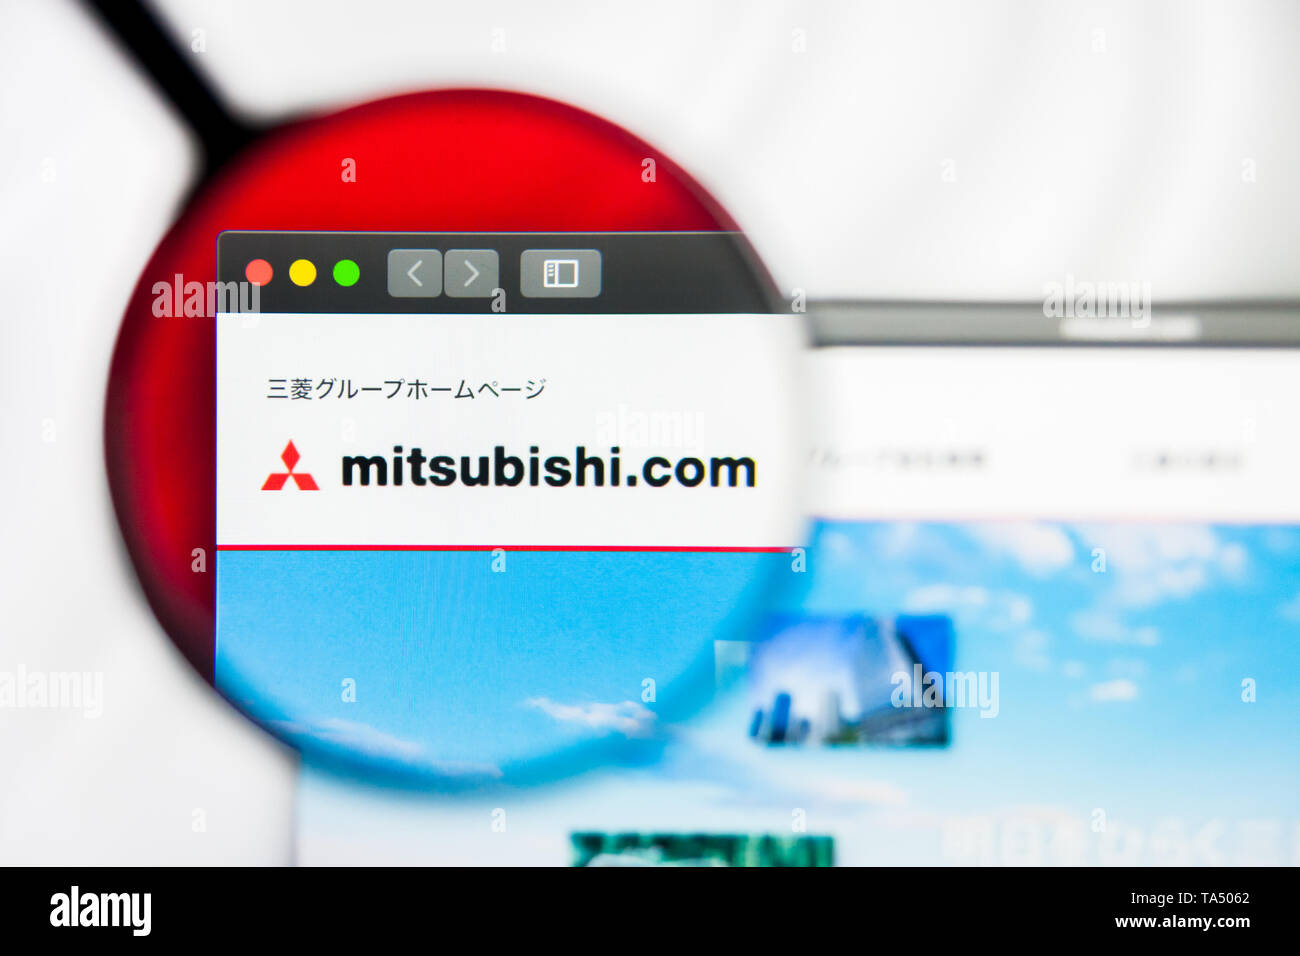 Mitsubishi Corporation Stock Photos & Mitsubishi Corporation Stock